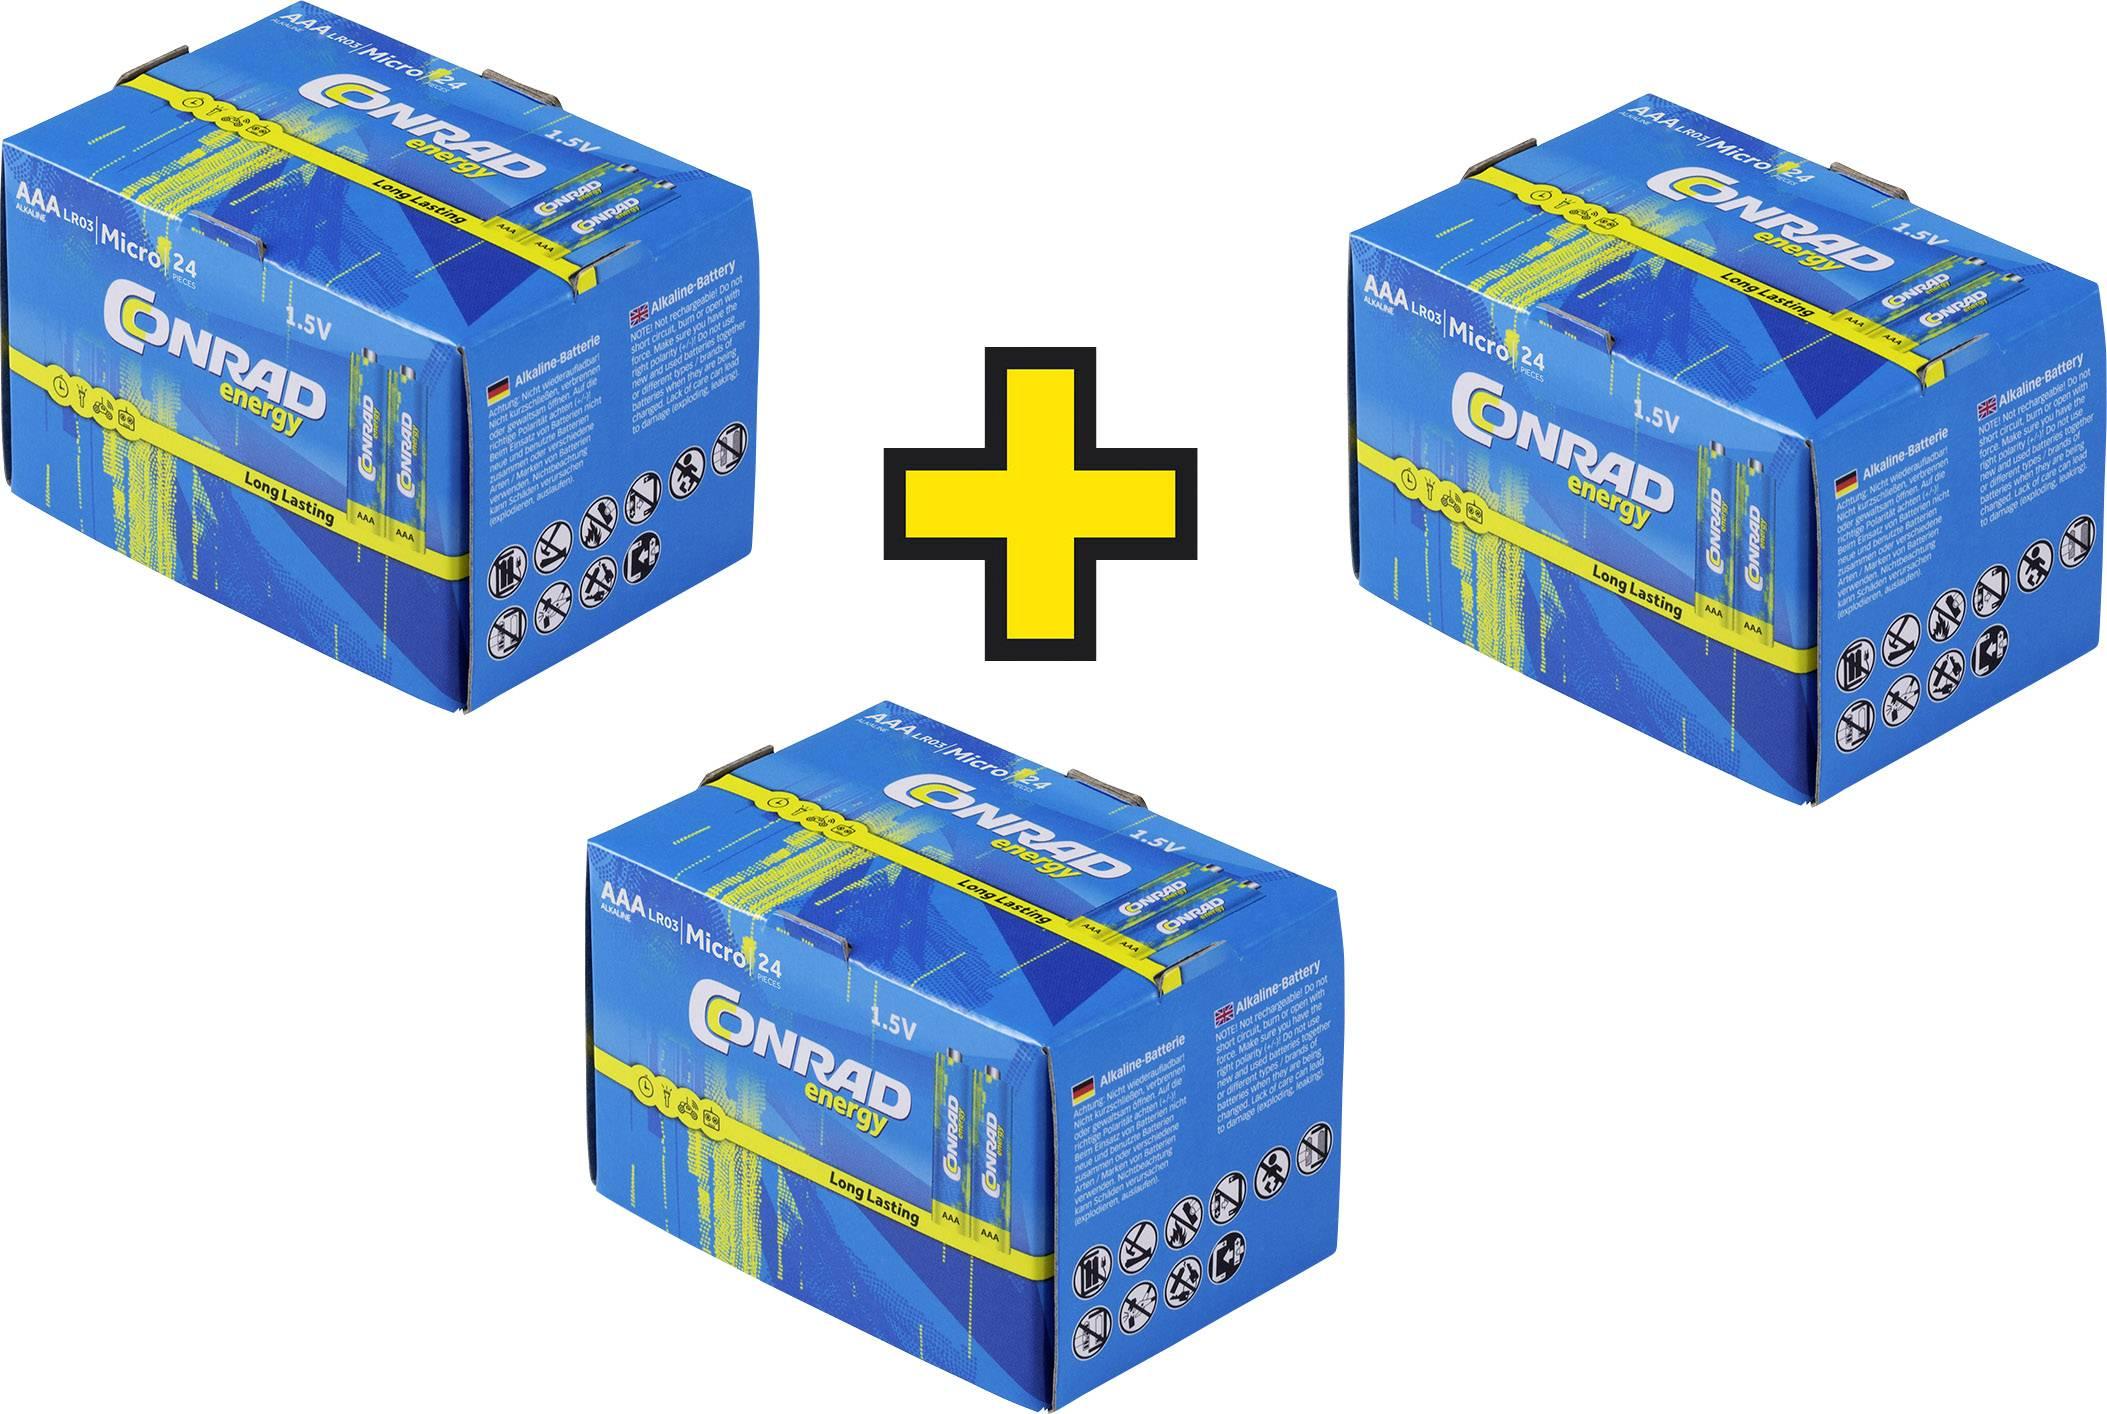 Mikrotužková baterie AAA alkalicko-manganová Conrad energy LR03, Kauf 3 Sets - zahl 2,, 1.5 V, 72 ks